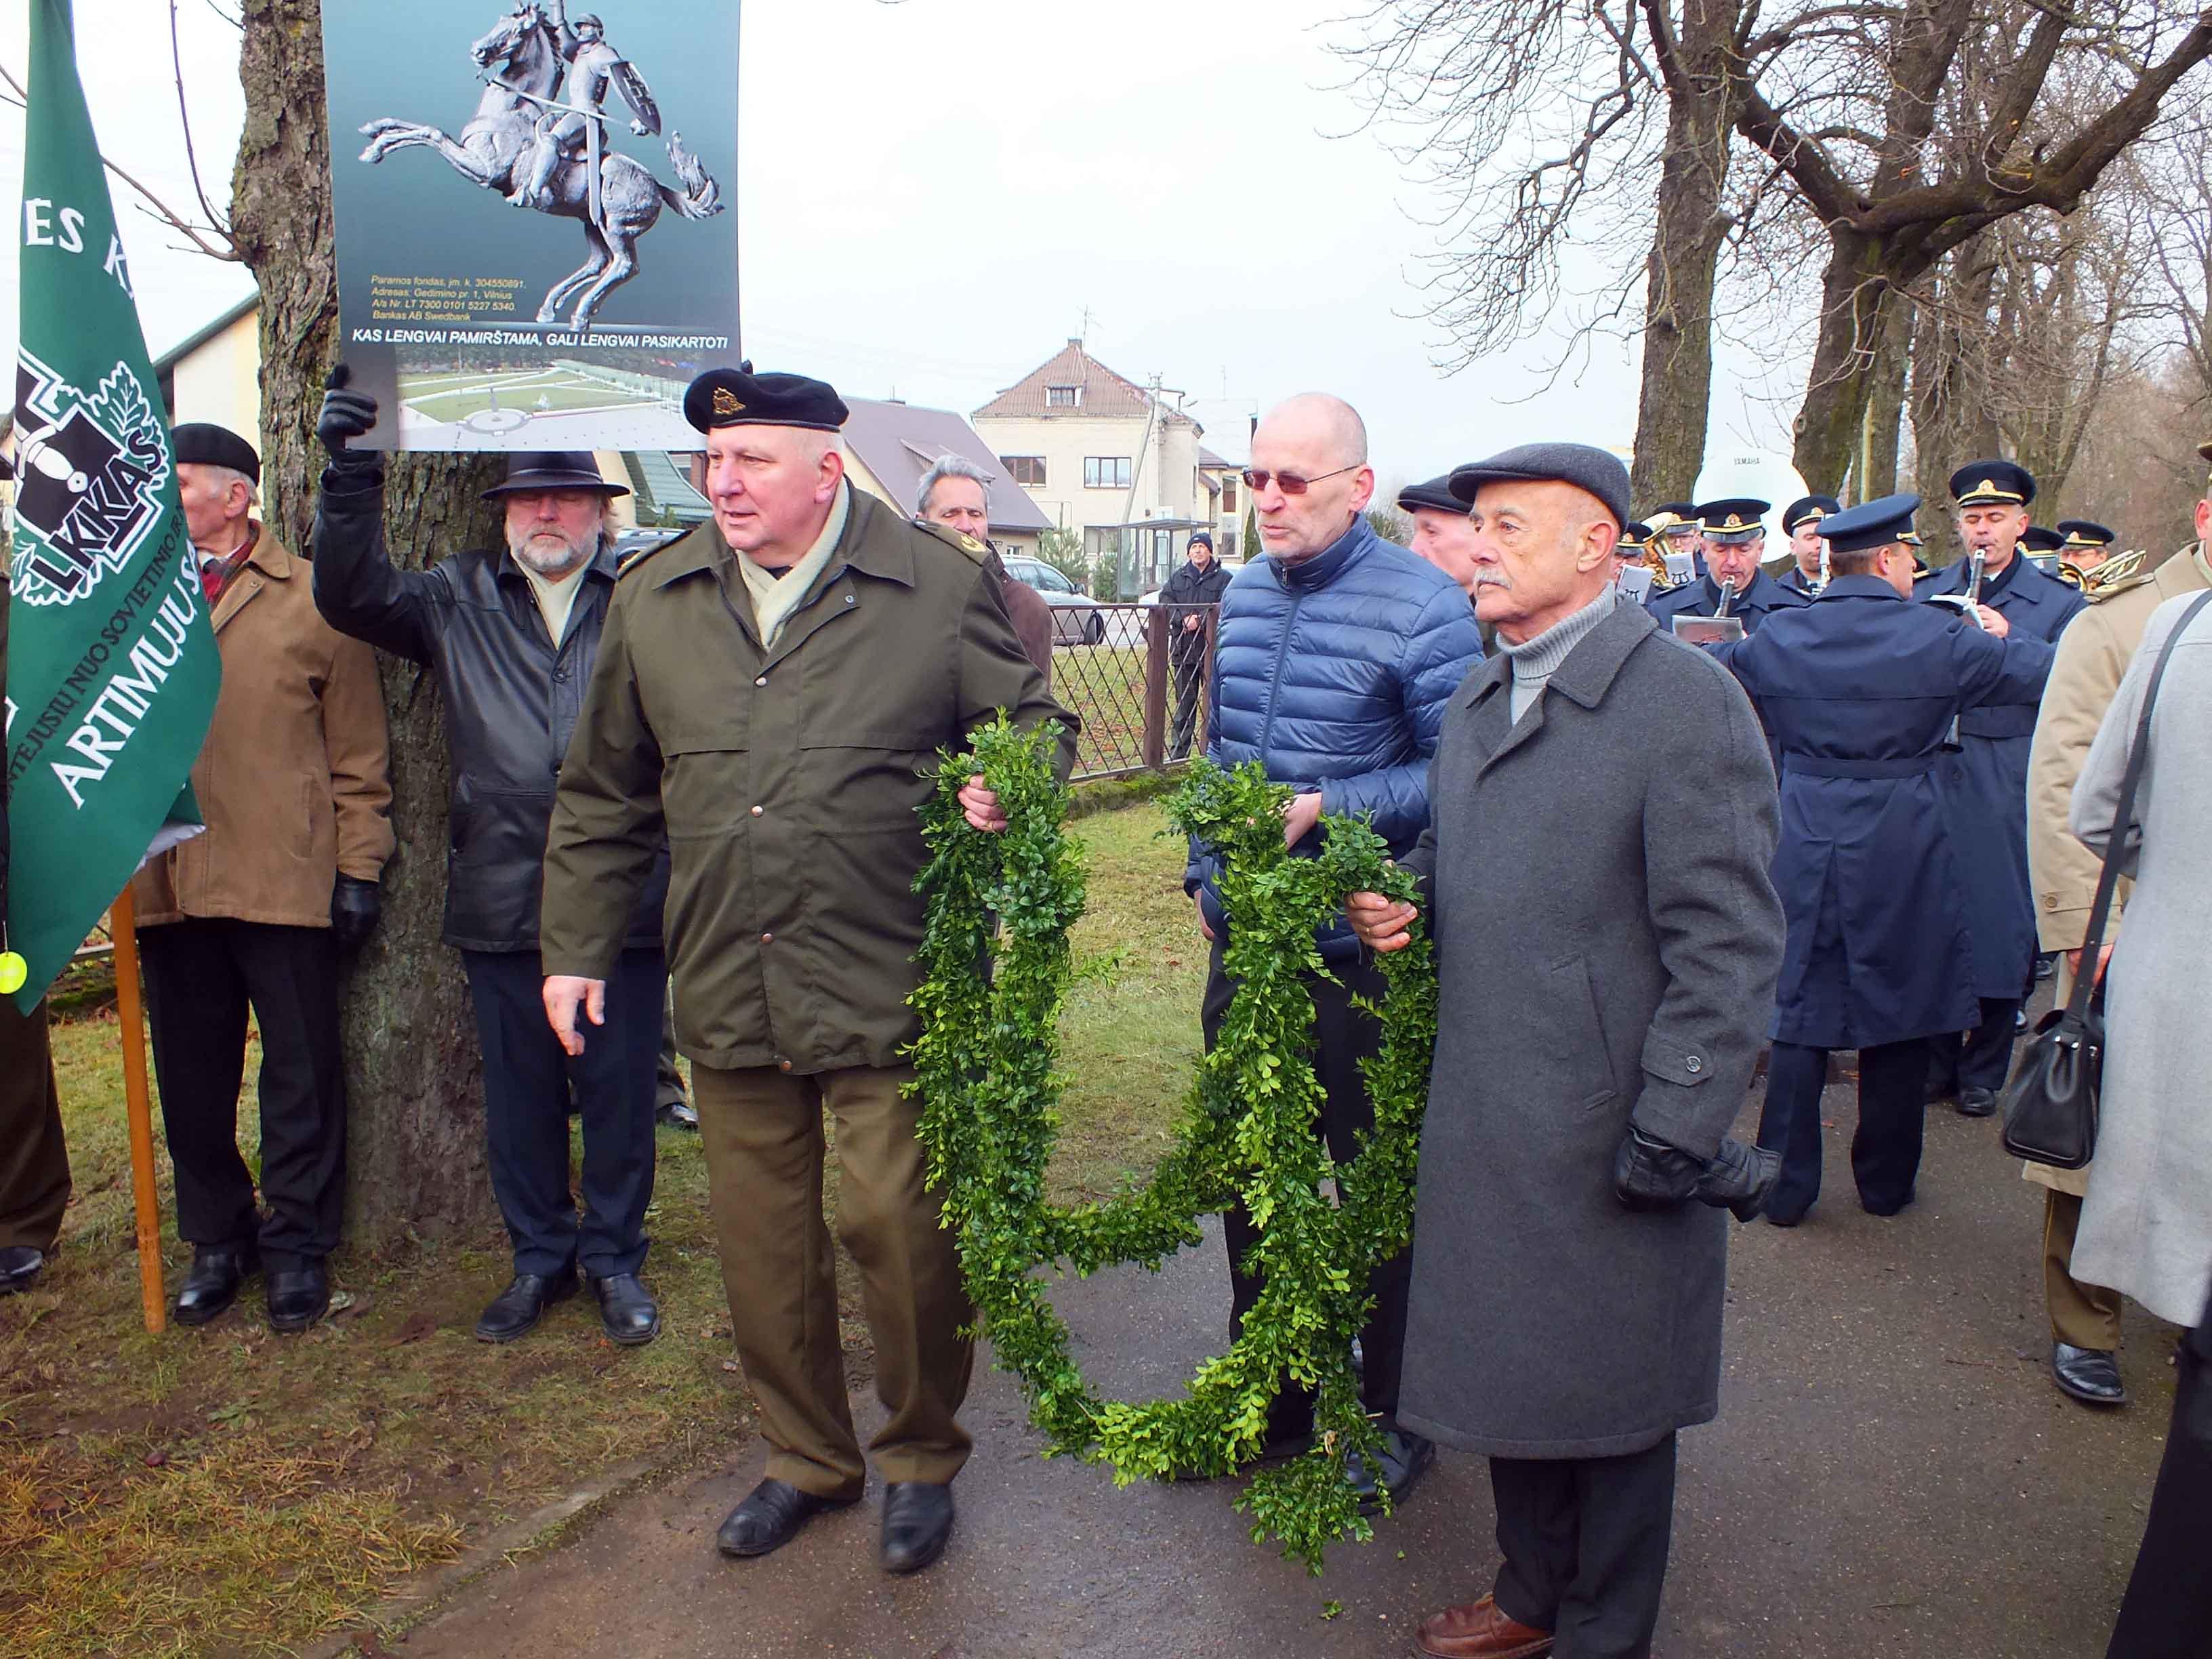 Iš kairės: dim. mjr. G. Reutas, S. Pūtvis ir V. Zabielskas | P. Šimkavičiaus nuotr.